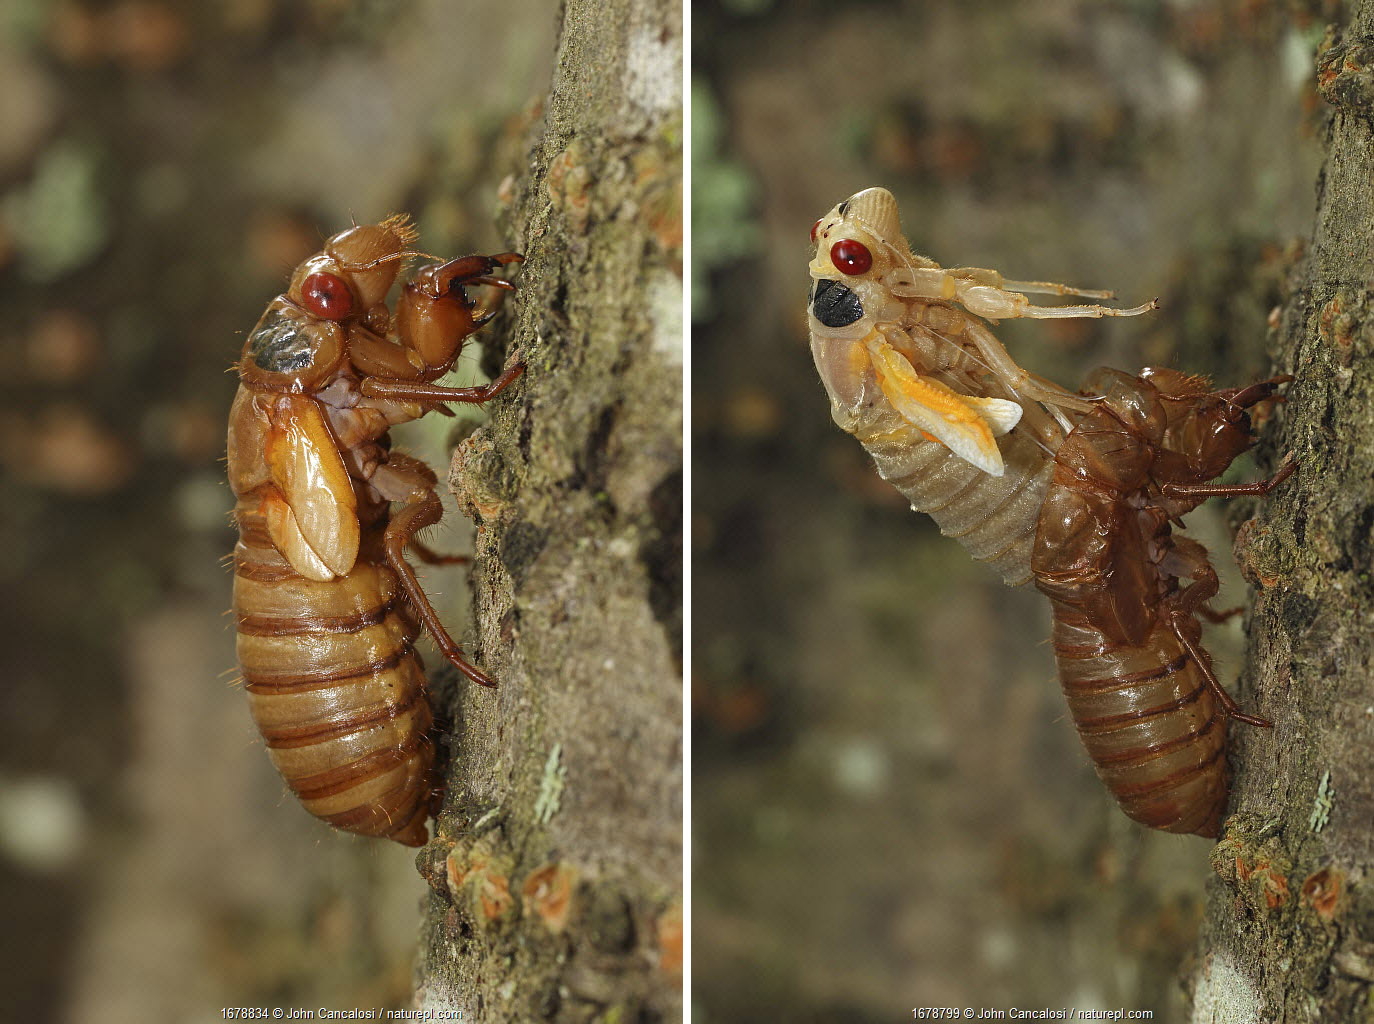 17 year Periodical cicada (Magicicada septendecim) recently emerged larva (left), teneral adult Brood X cicada, molting (right), Maryland, USA, June 2021